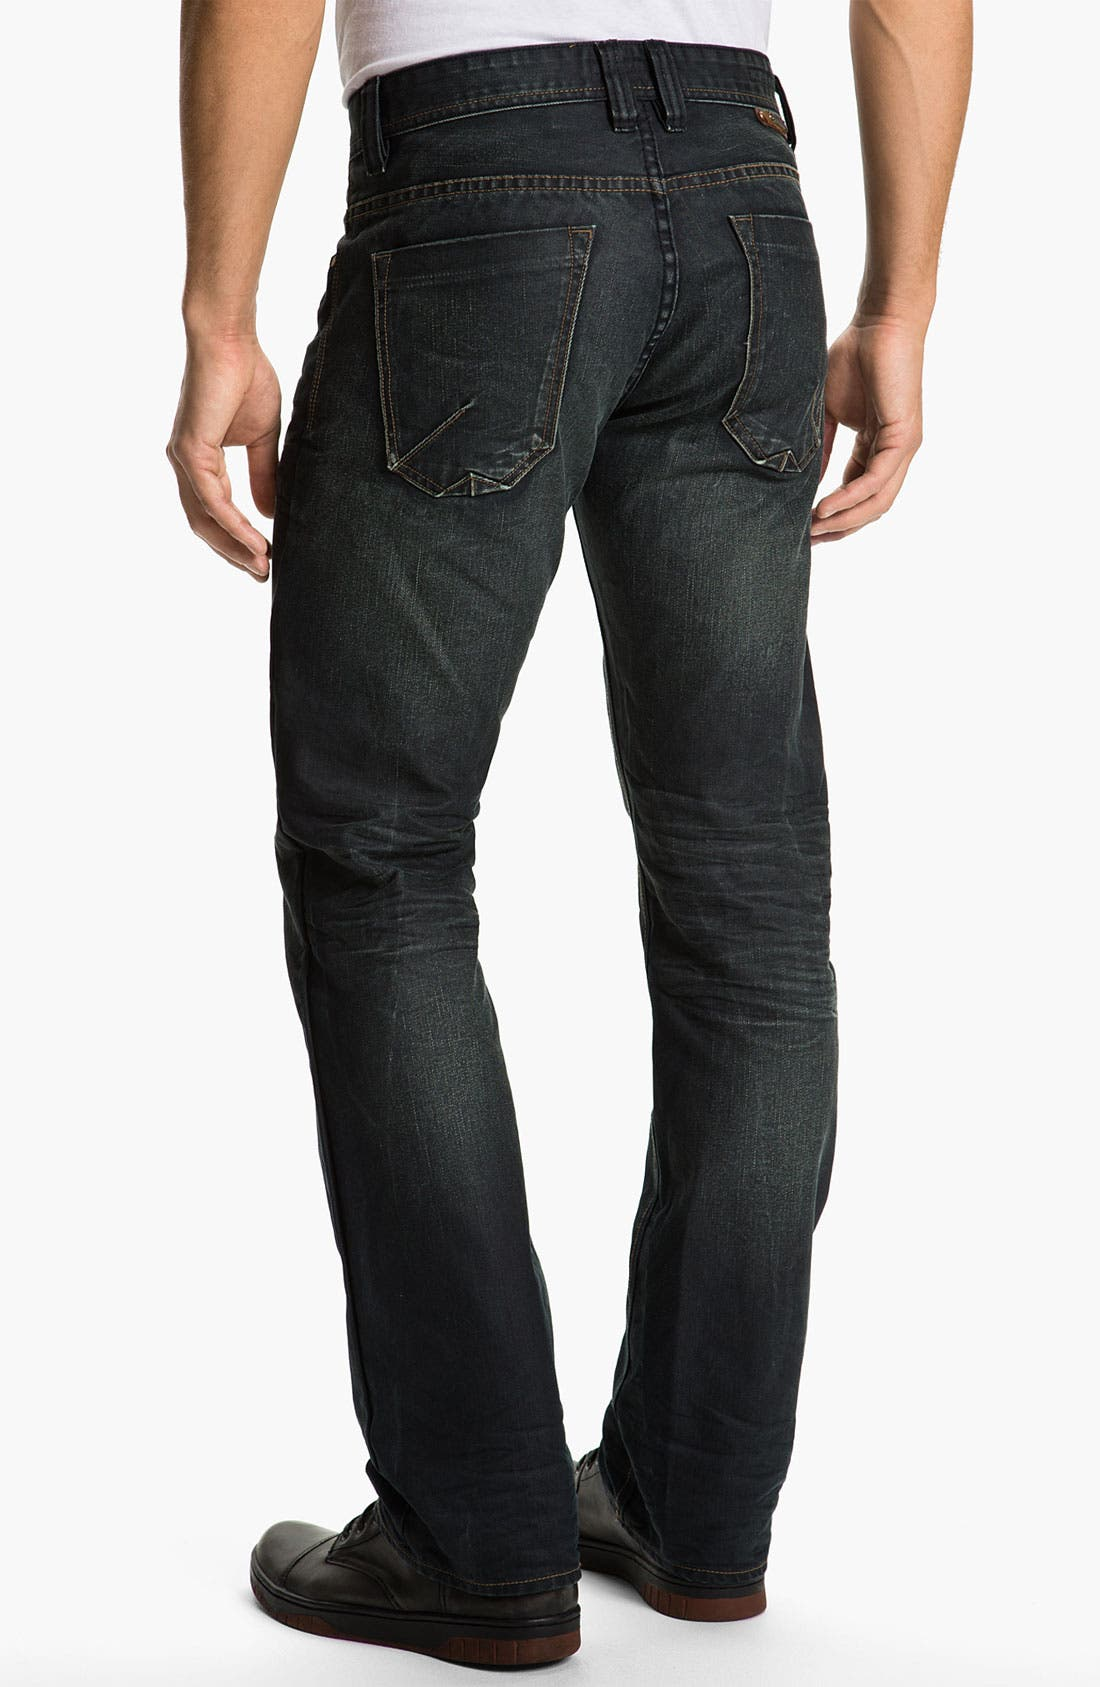 Alternate Image 1 Selected - Projek Raw Relaxed Straight Leg Jeans (Dark Blue)